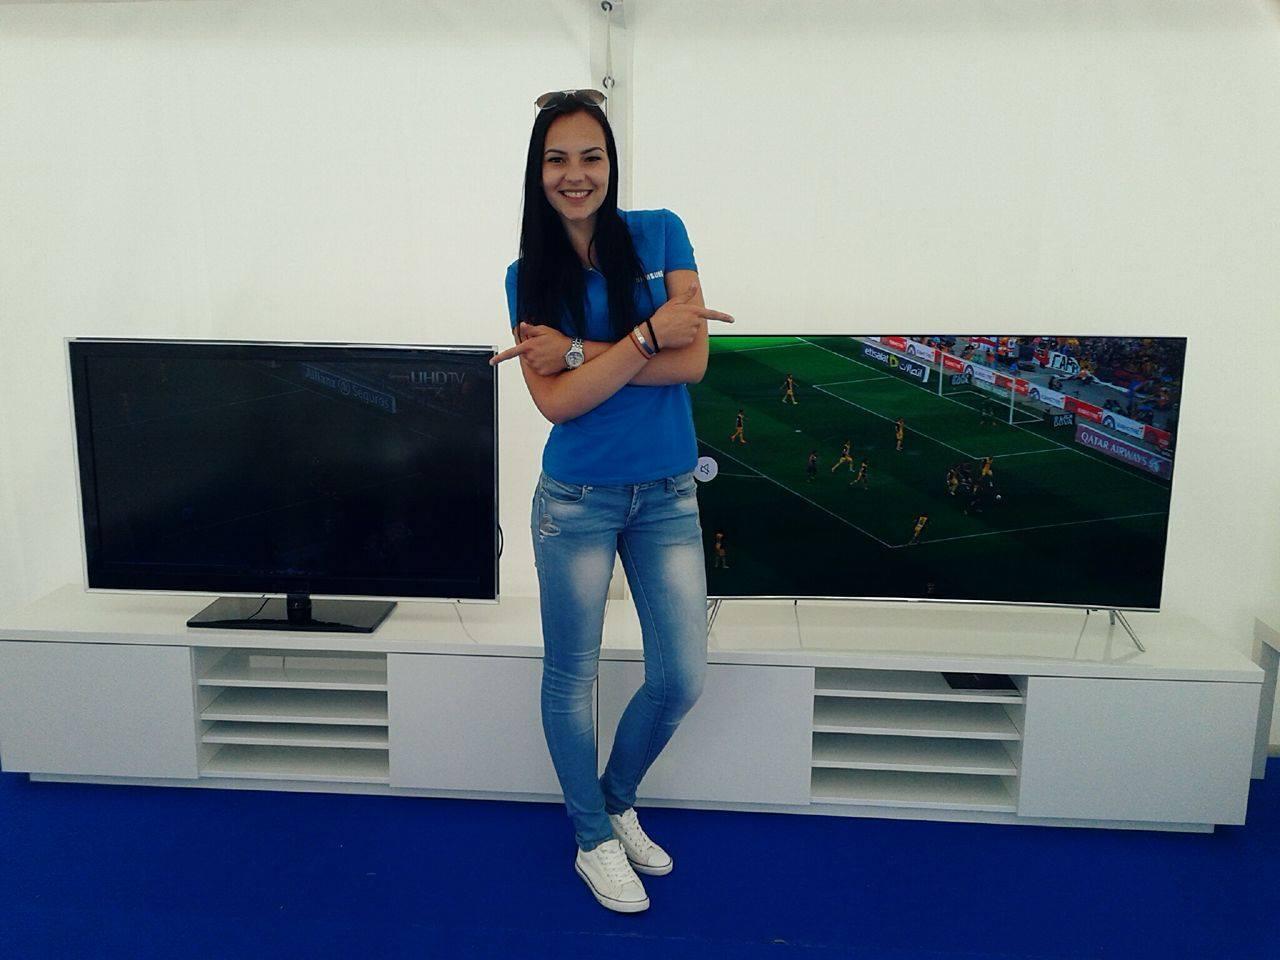 e7438cfae promo Samsung TV · Tullamore tour · promo Samsung 3D okuliarov